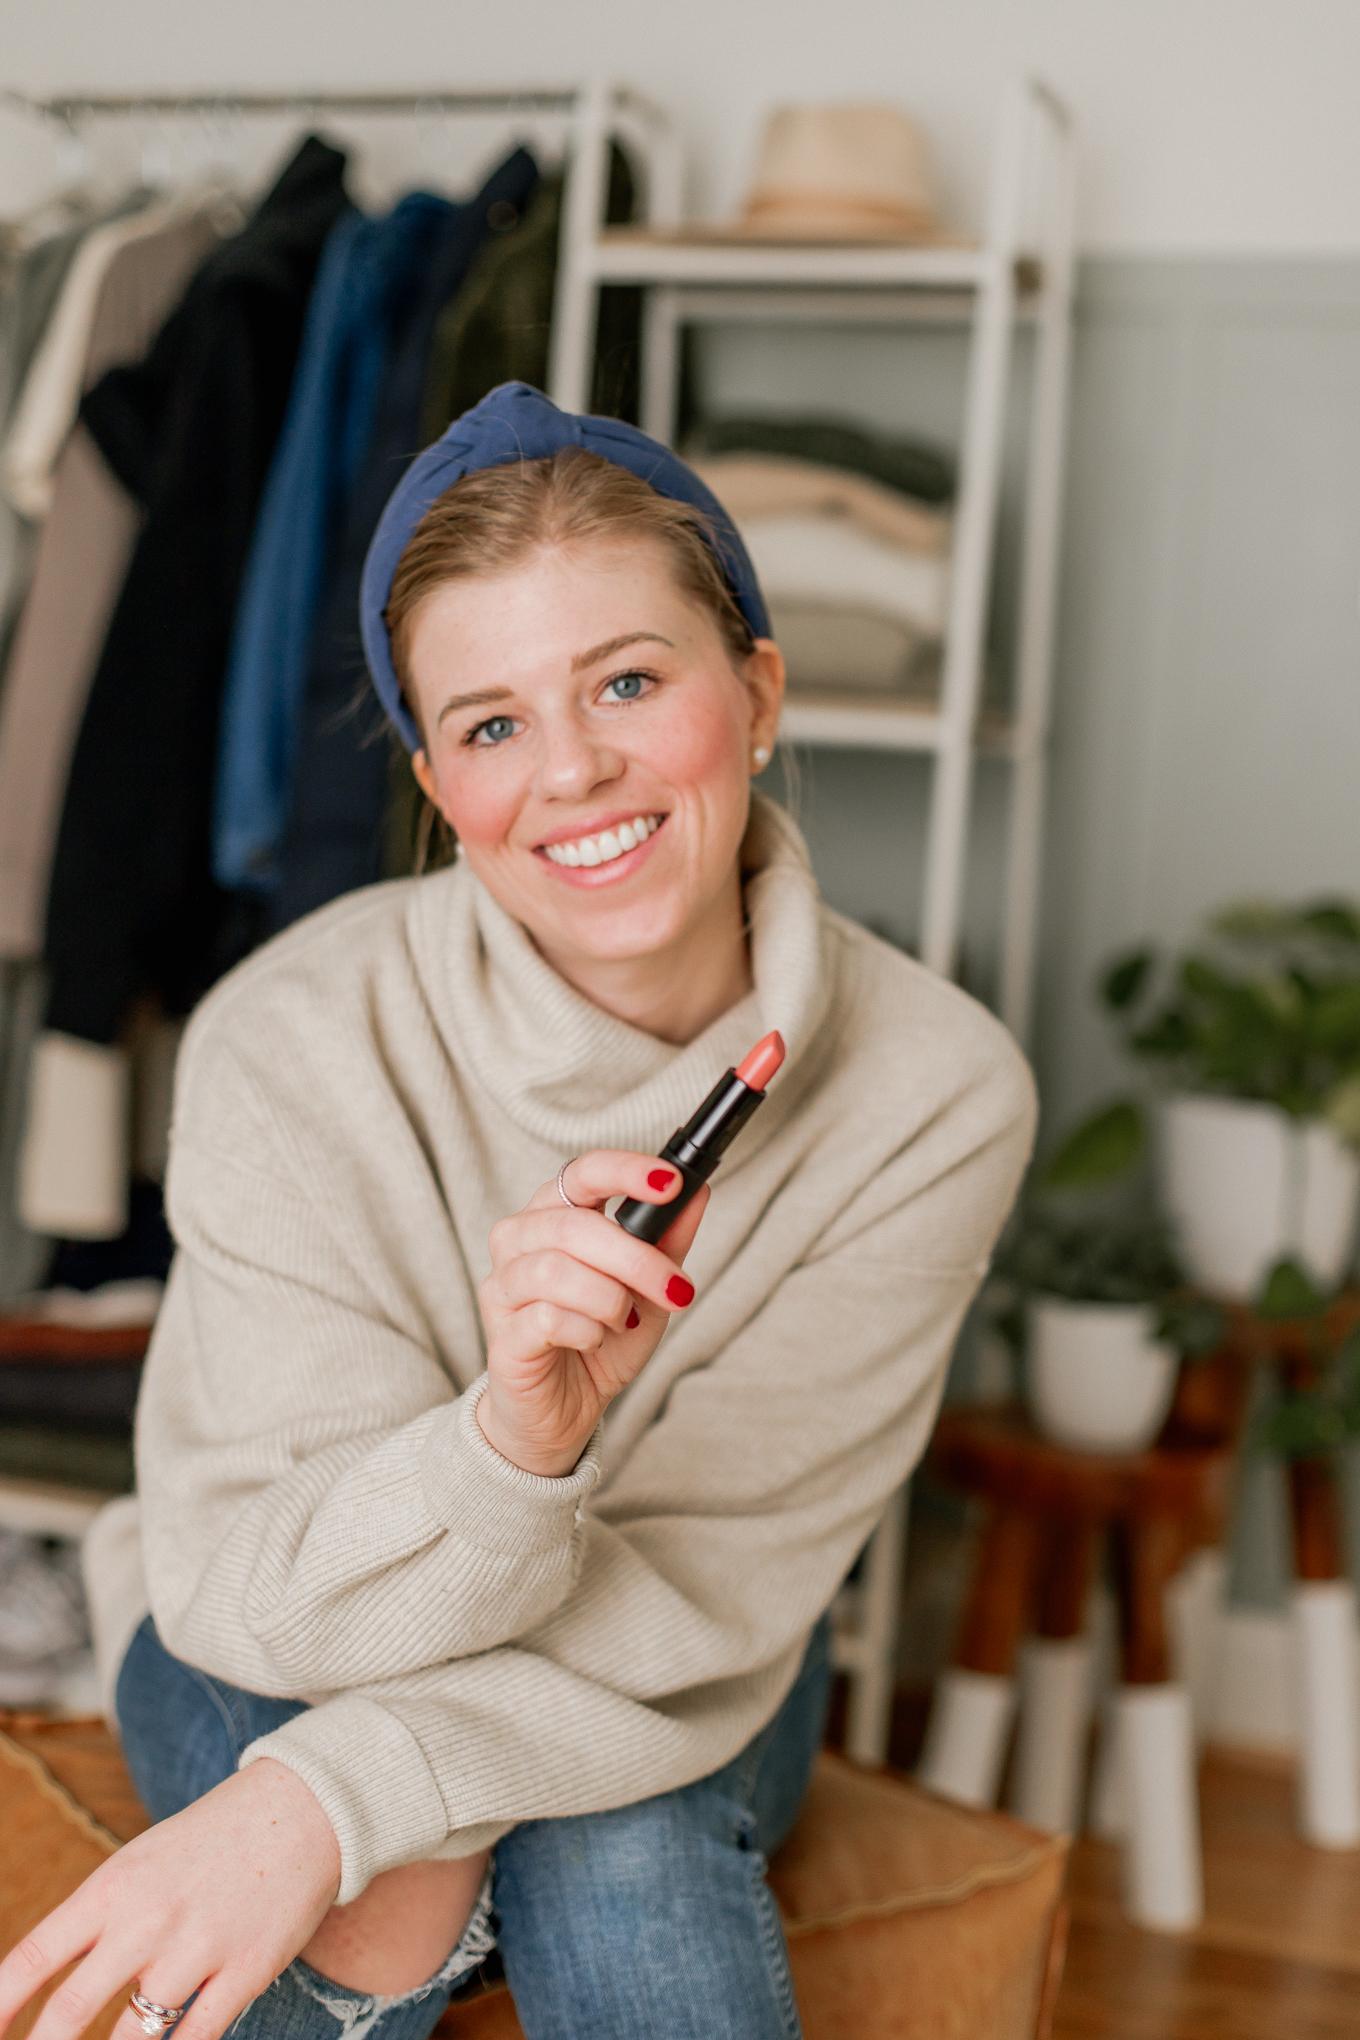 Budget-Friendly Clean Beauty Favorites | L'BRI Pure N' Natural | Louella Reese #cleanbeauty #makeup #budgetfriendlybeauty